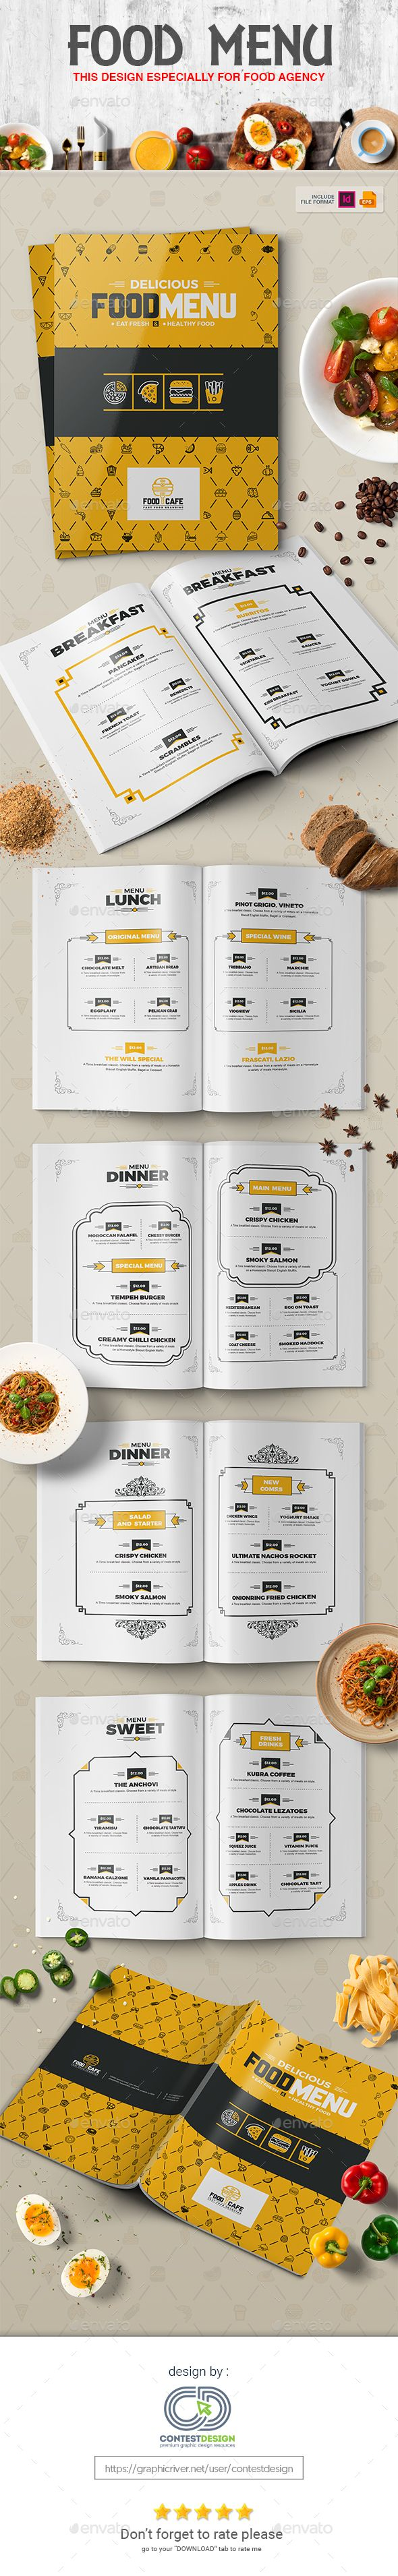 #Food #Menu Design Template for Fast Food / #Restaurants / Cafe - Food Menus Print Templates Download here: https://graphicriver.net/item/food-menu-design-template-for-fast-food-restaurants-cafe/20308240?ref=alena994